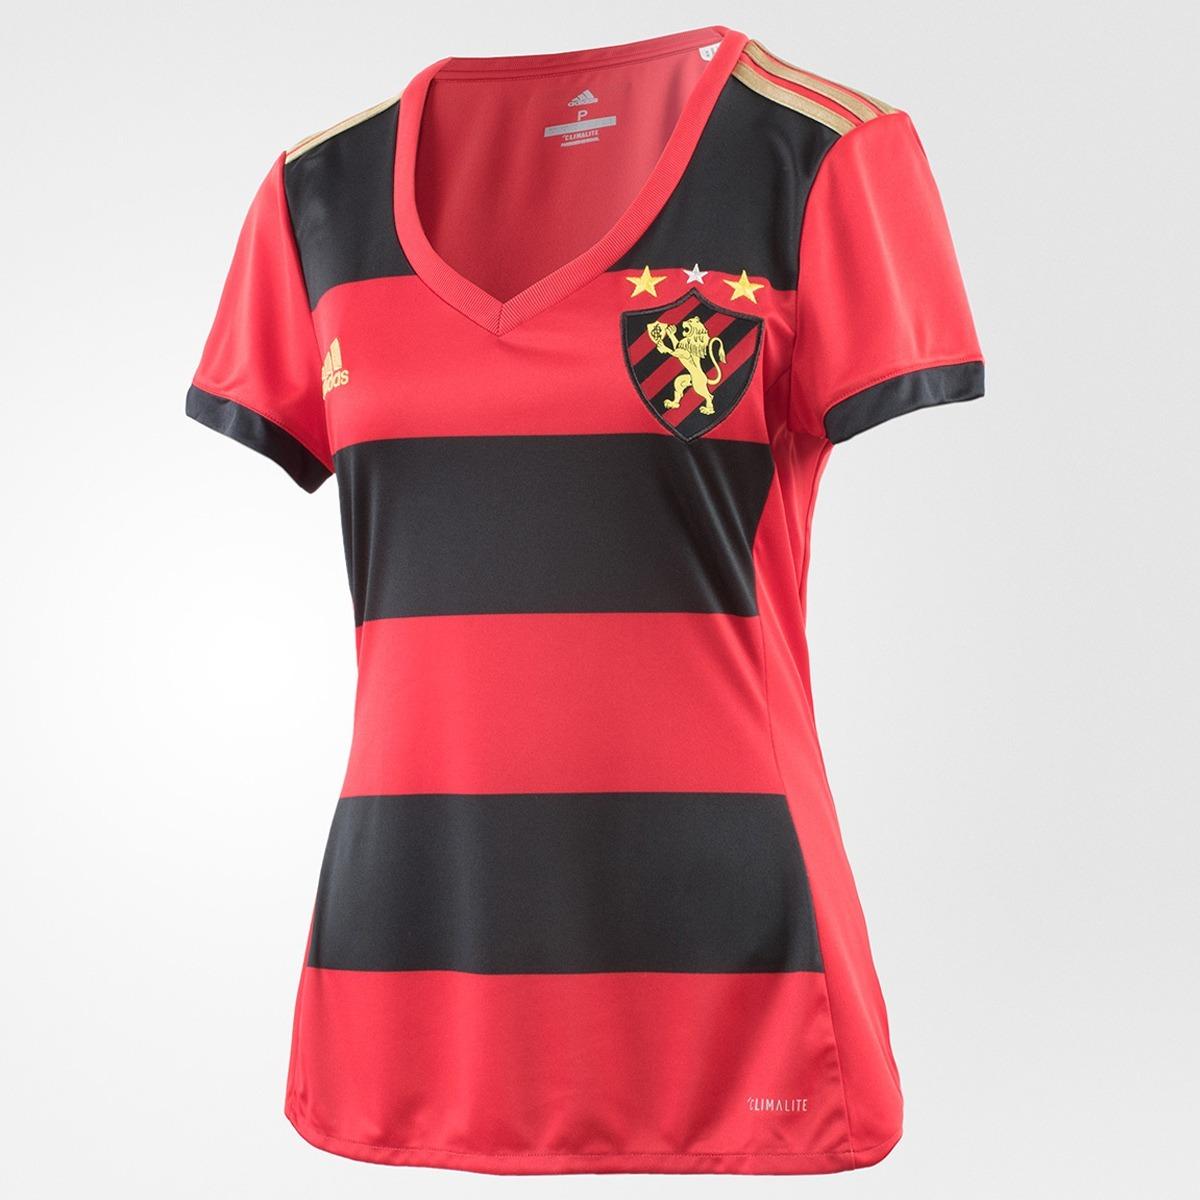 d52e8ac71fe Camisa adidas Sport Recife I 17 18 - Feminina - R  135